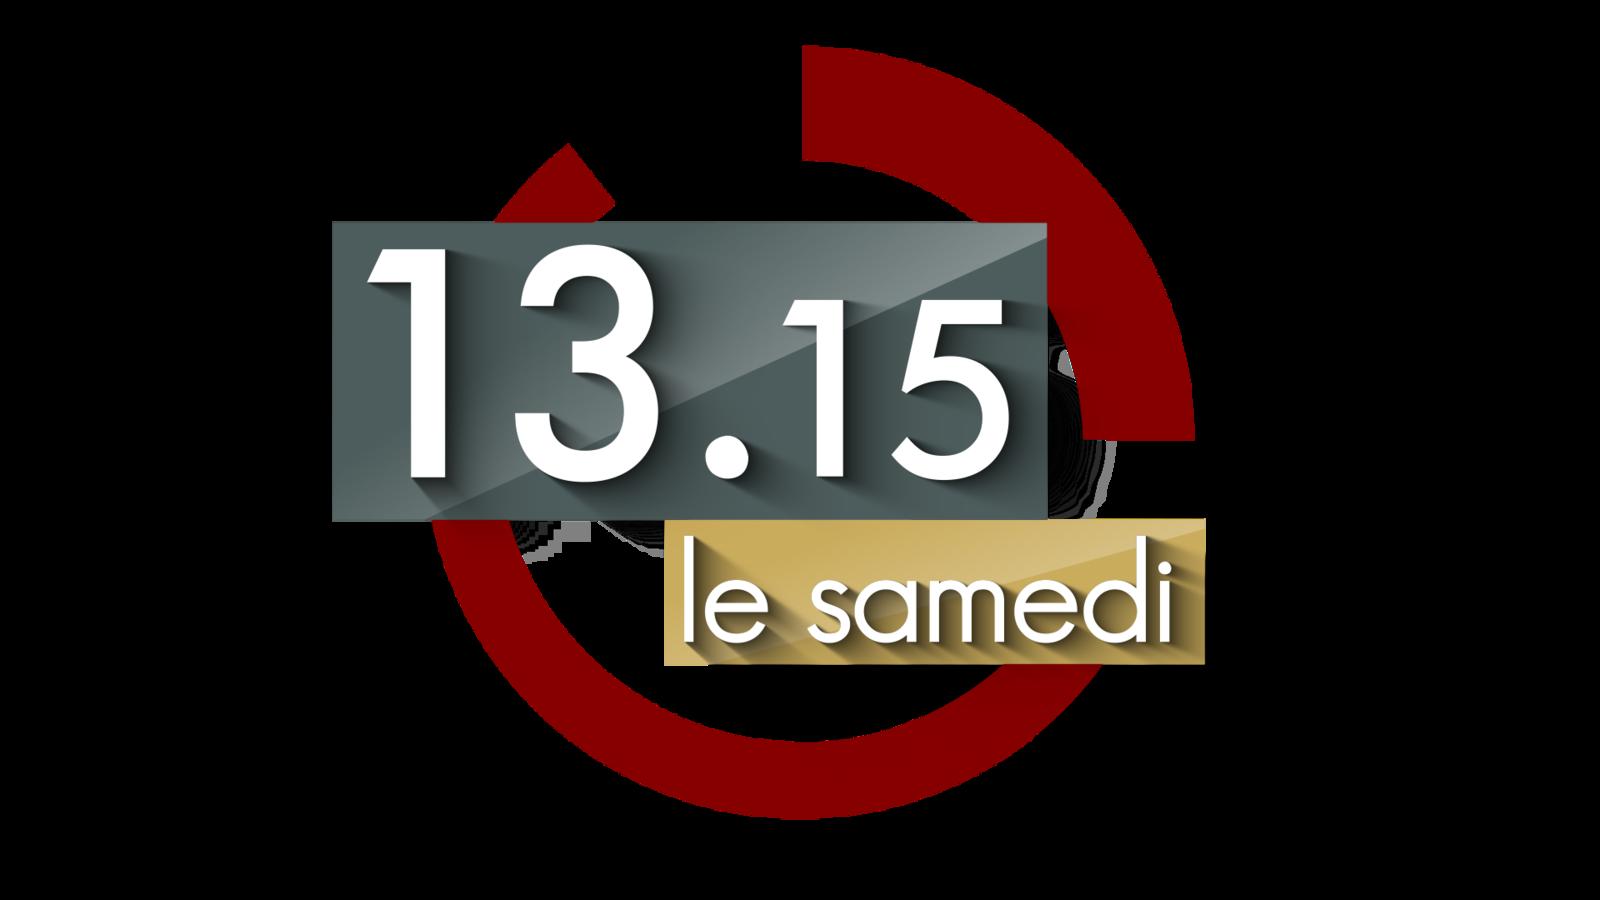 Passion Globe ce samedi à 13h15 sur France 2.